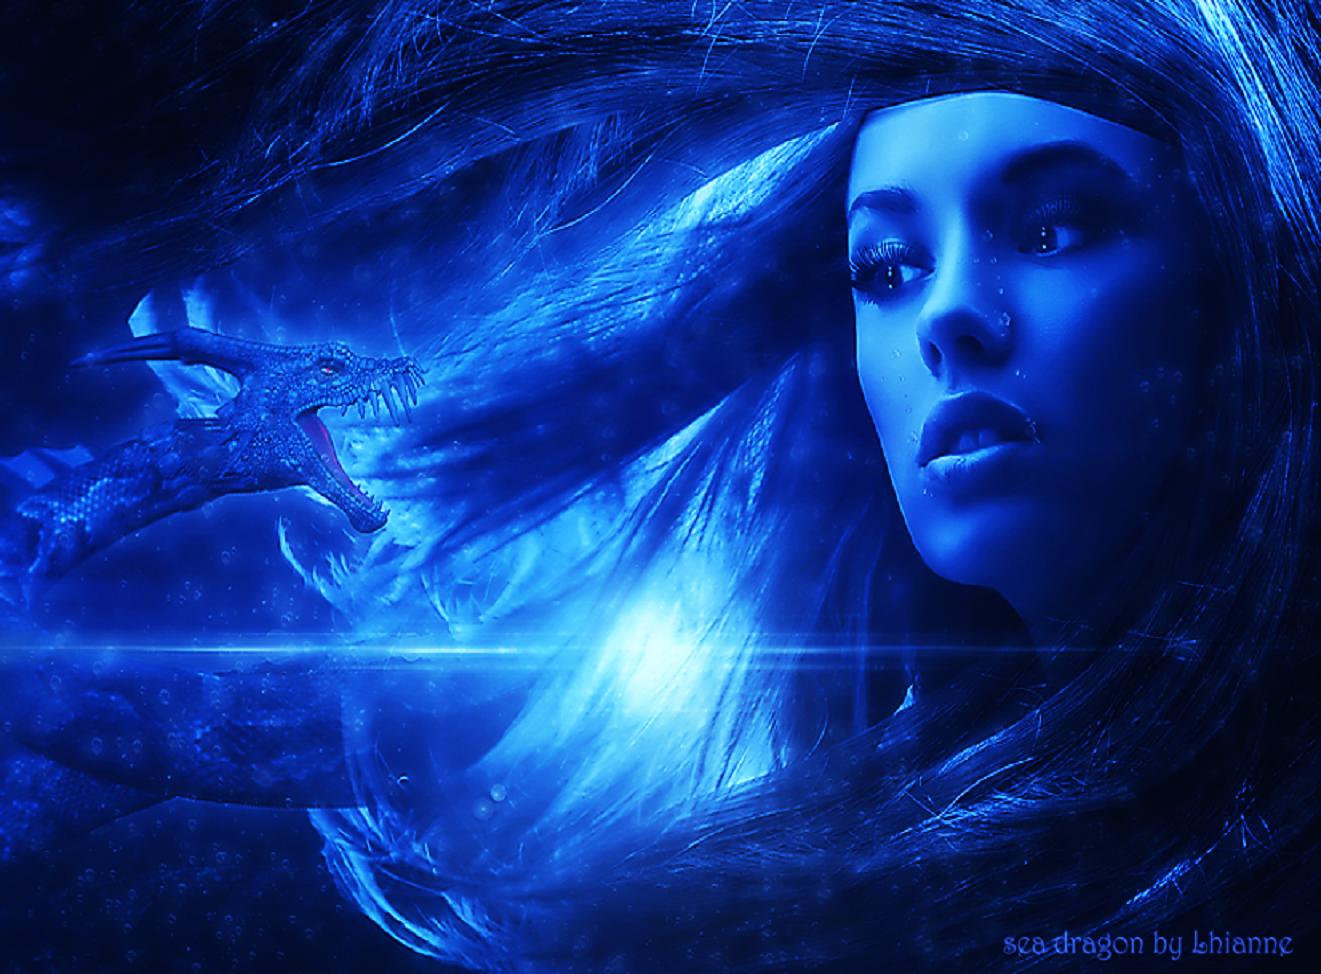 blue deviantart com sea_dragon_by_lhianne-d5cgbzy (2)